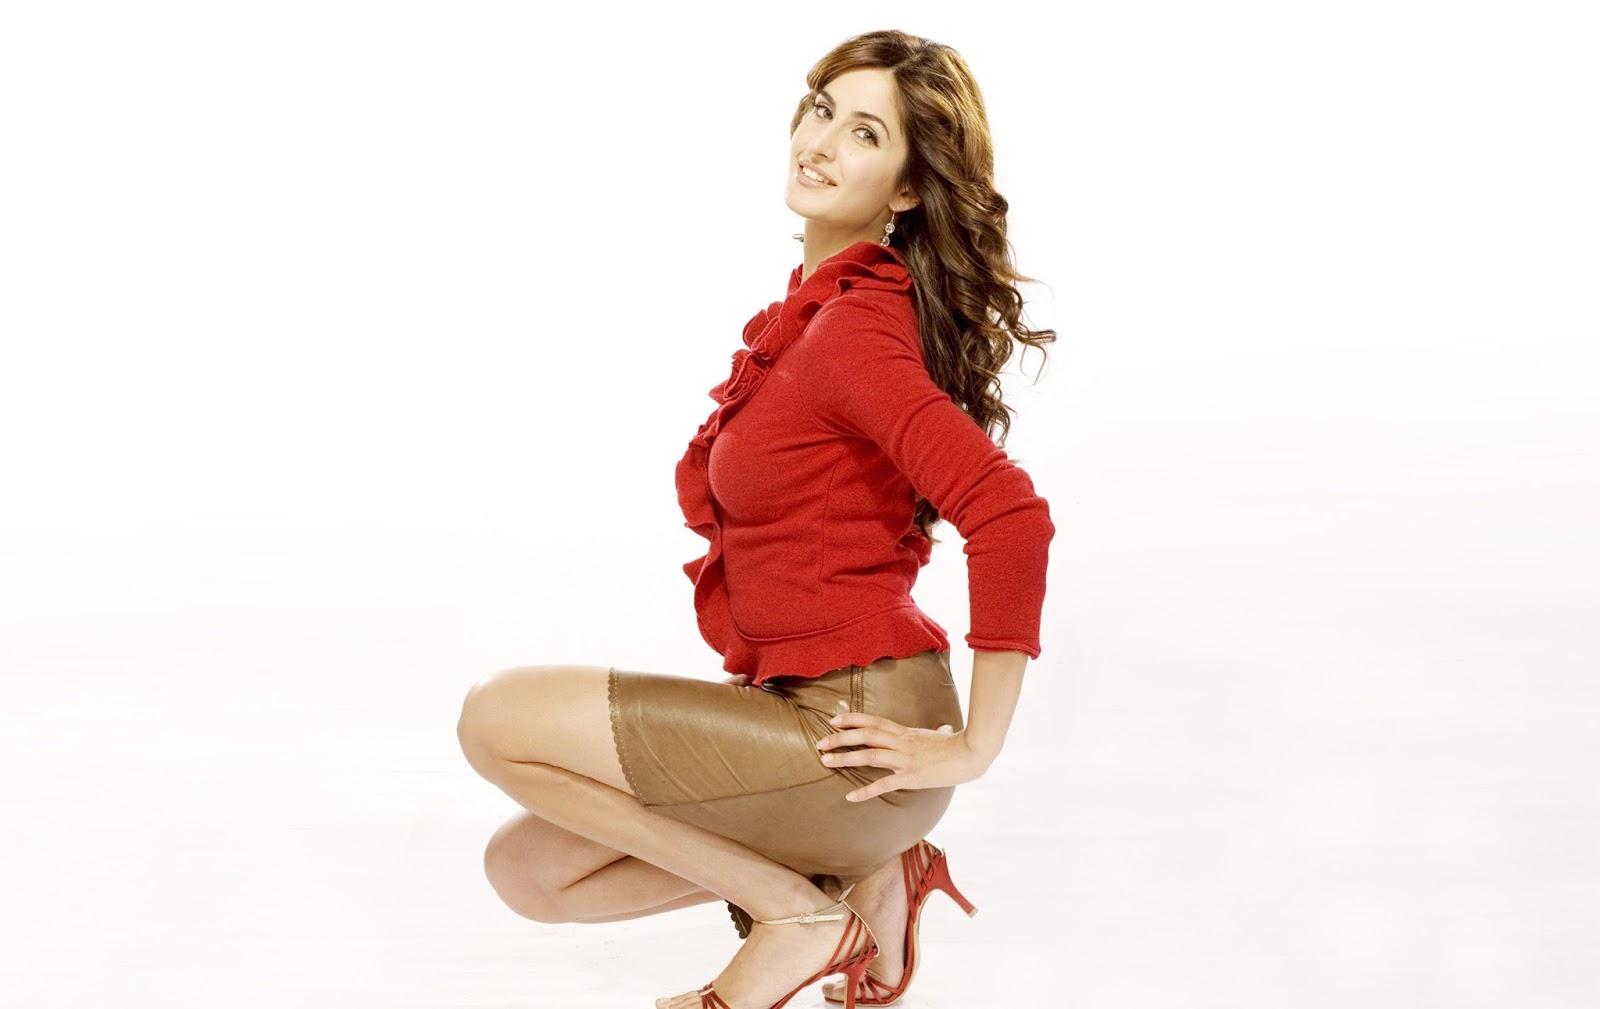 Katrina Kaif HD Images